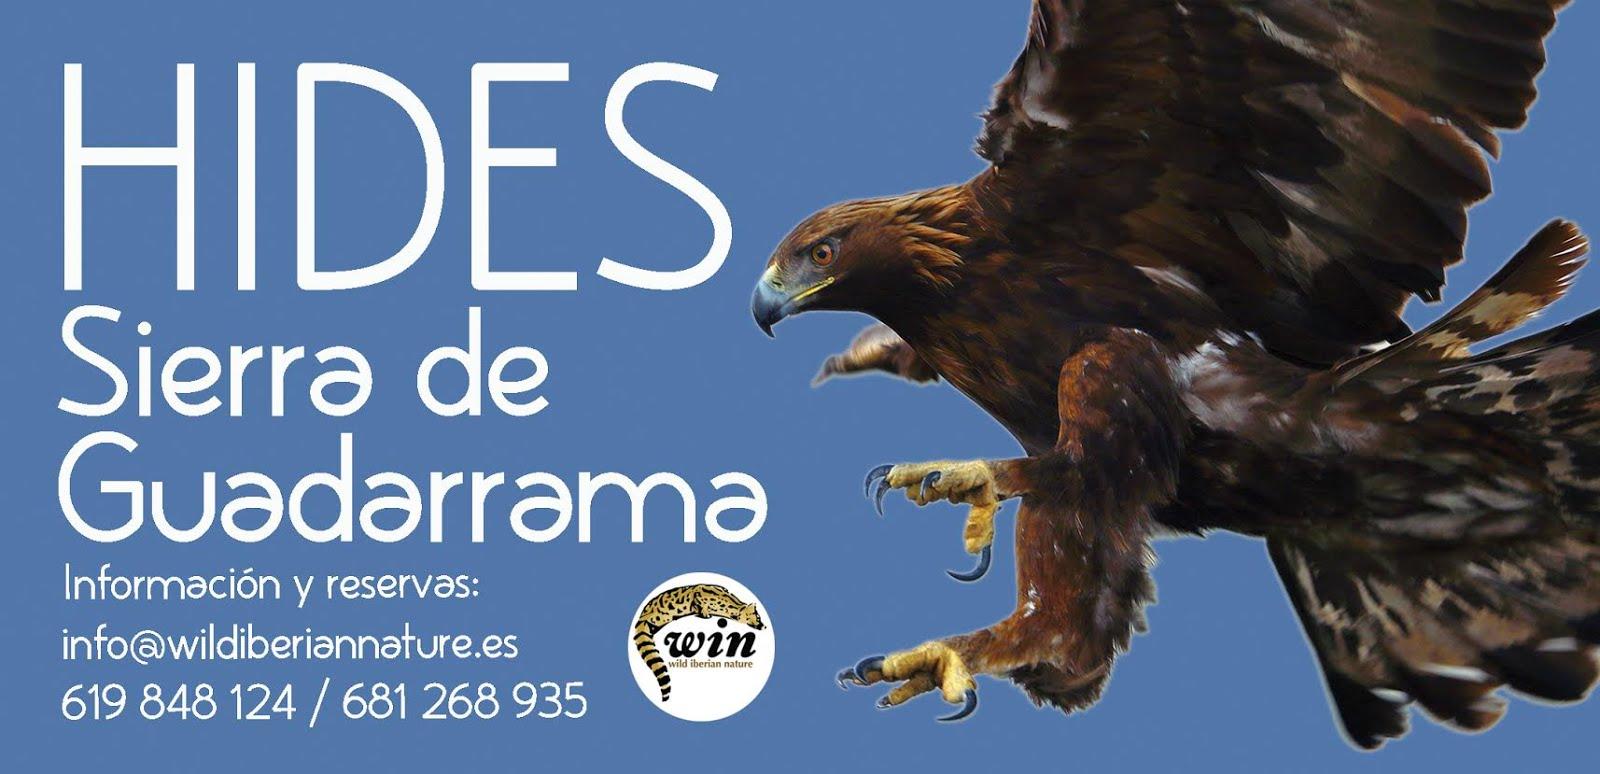 HIDES SIERRA DE GUADARRAMA